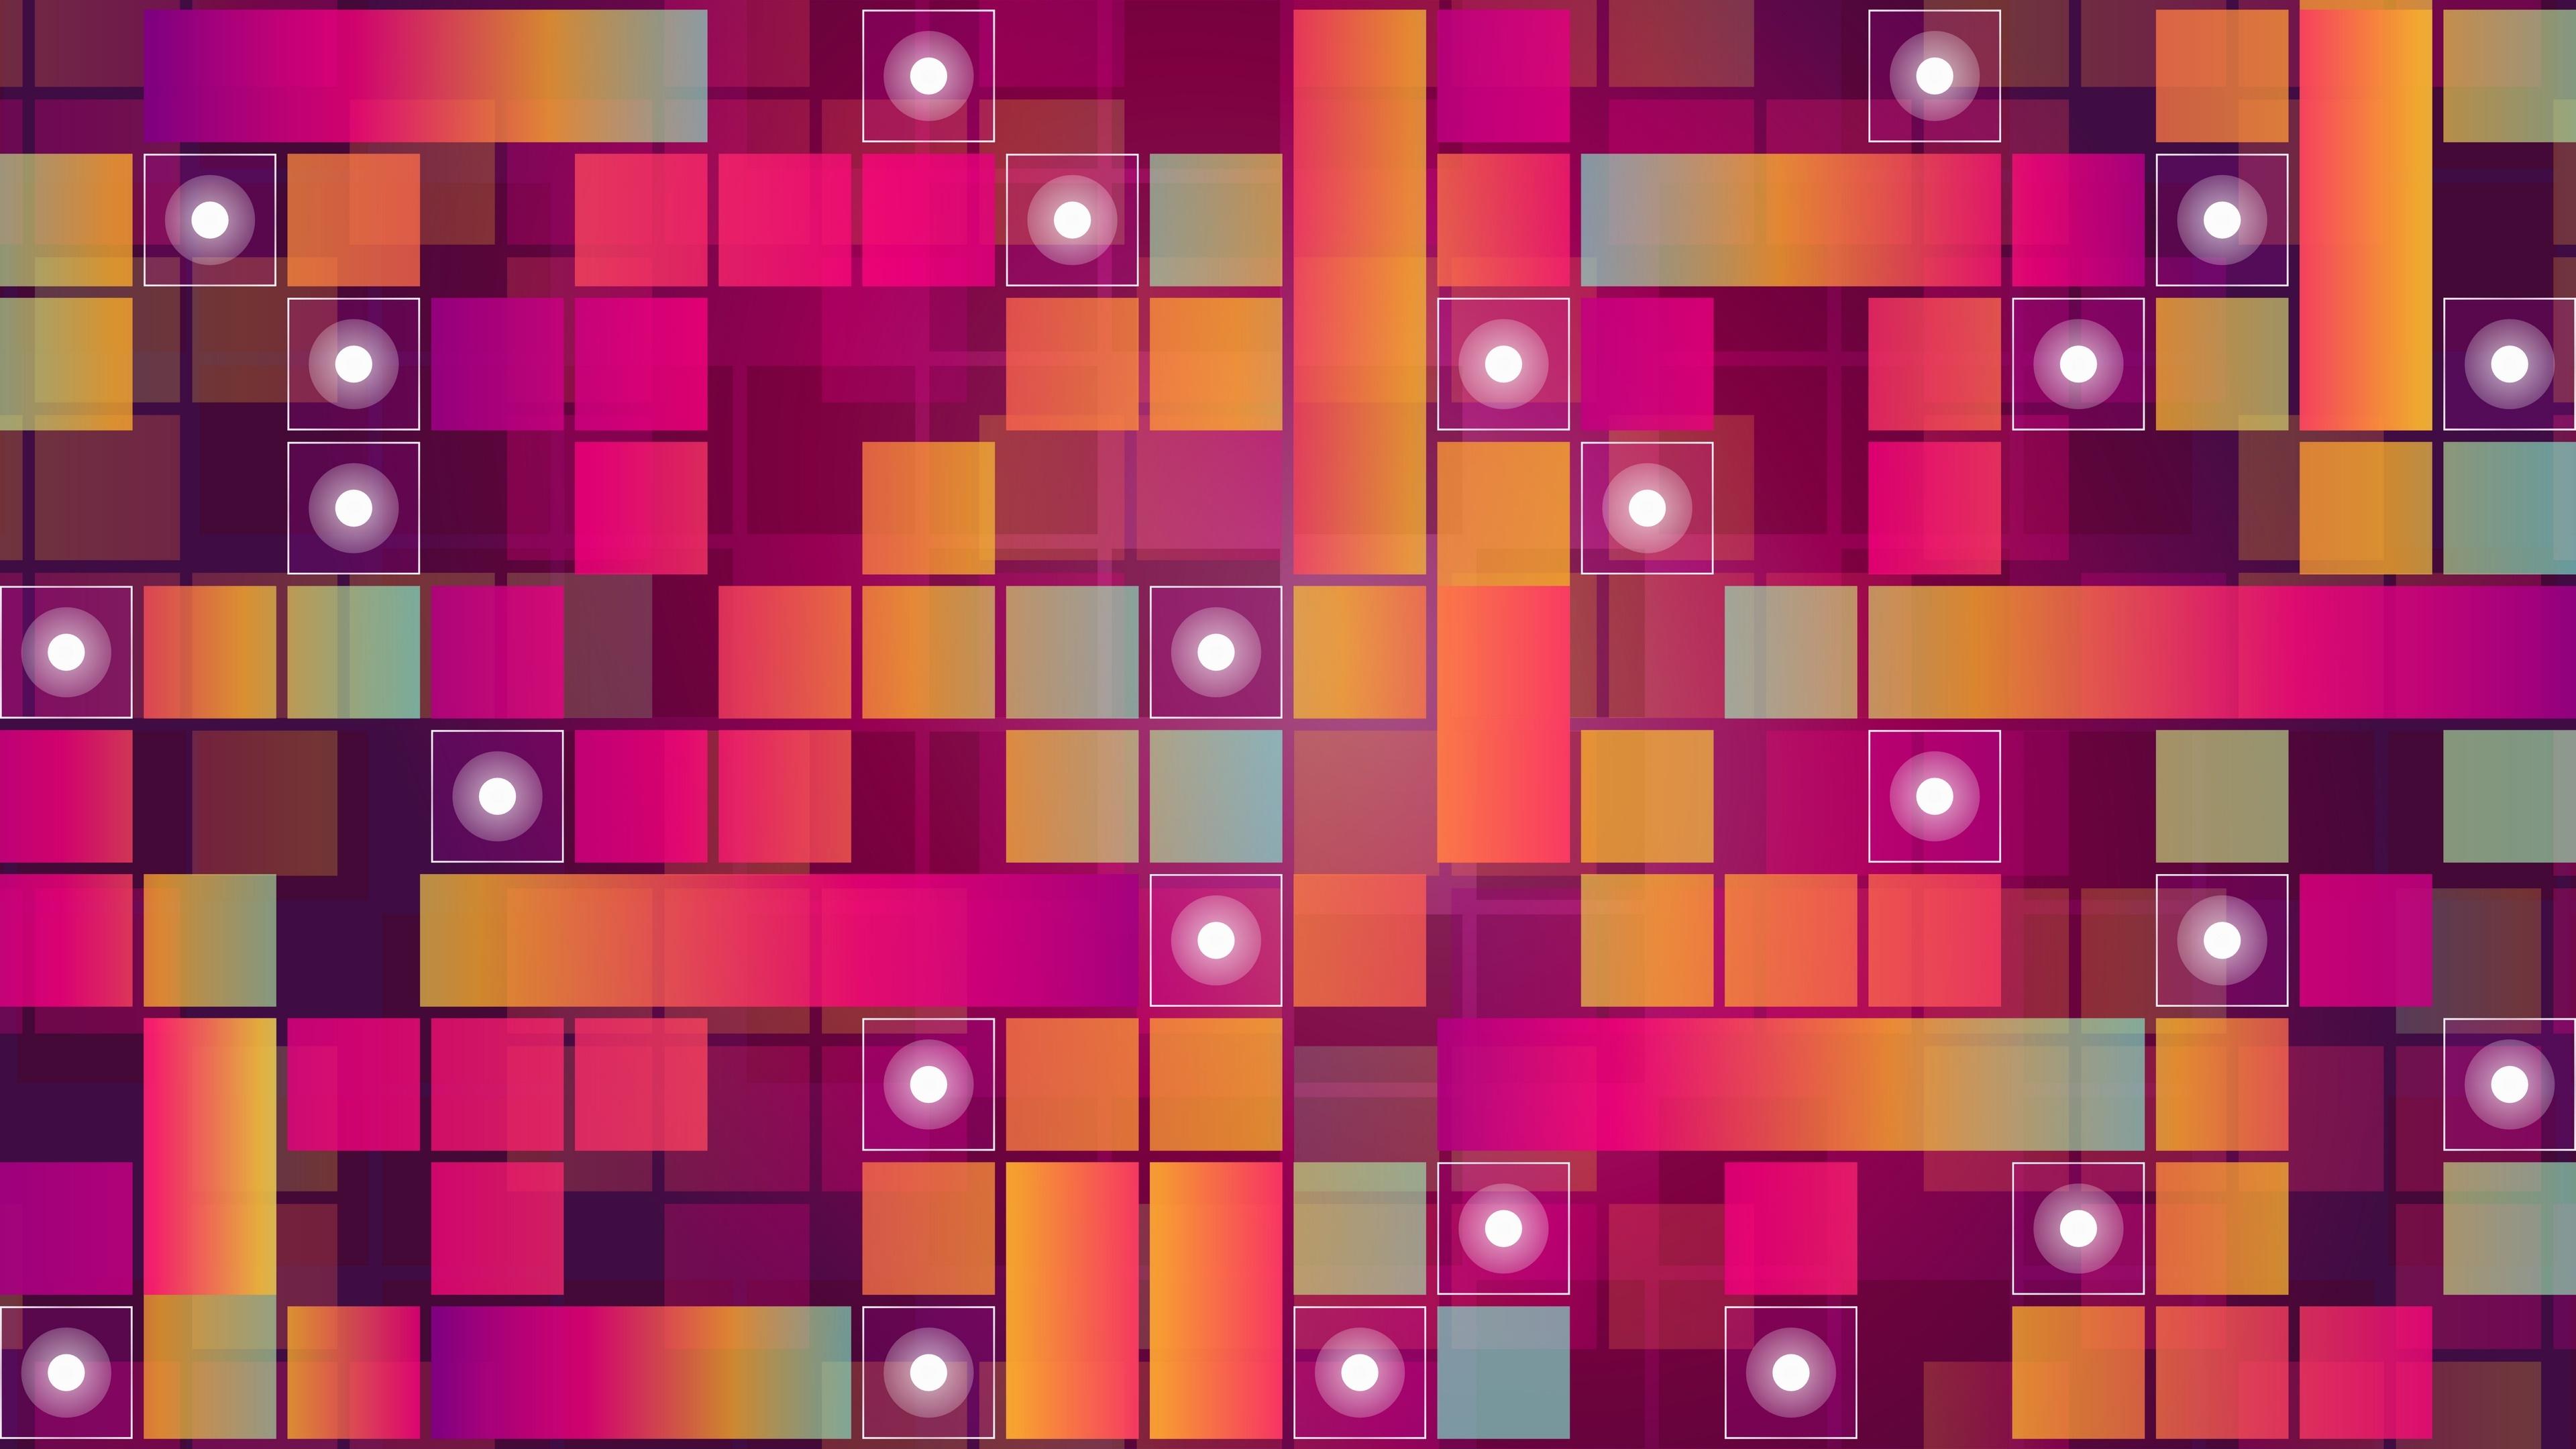 Pink mosaic design wallpaper